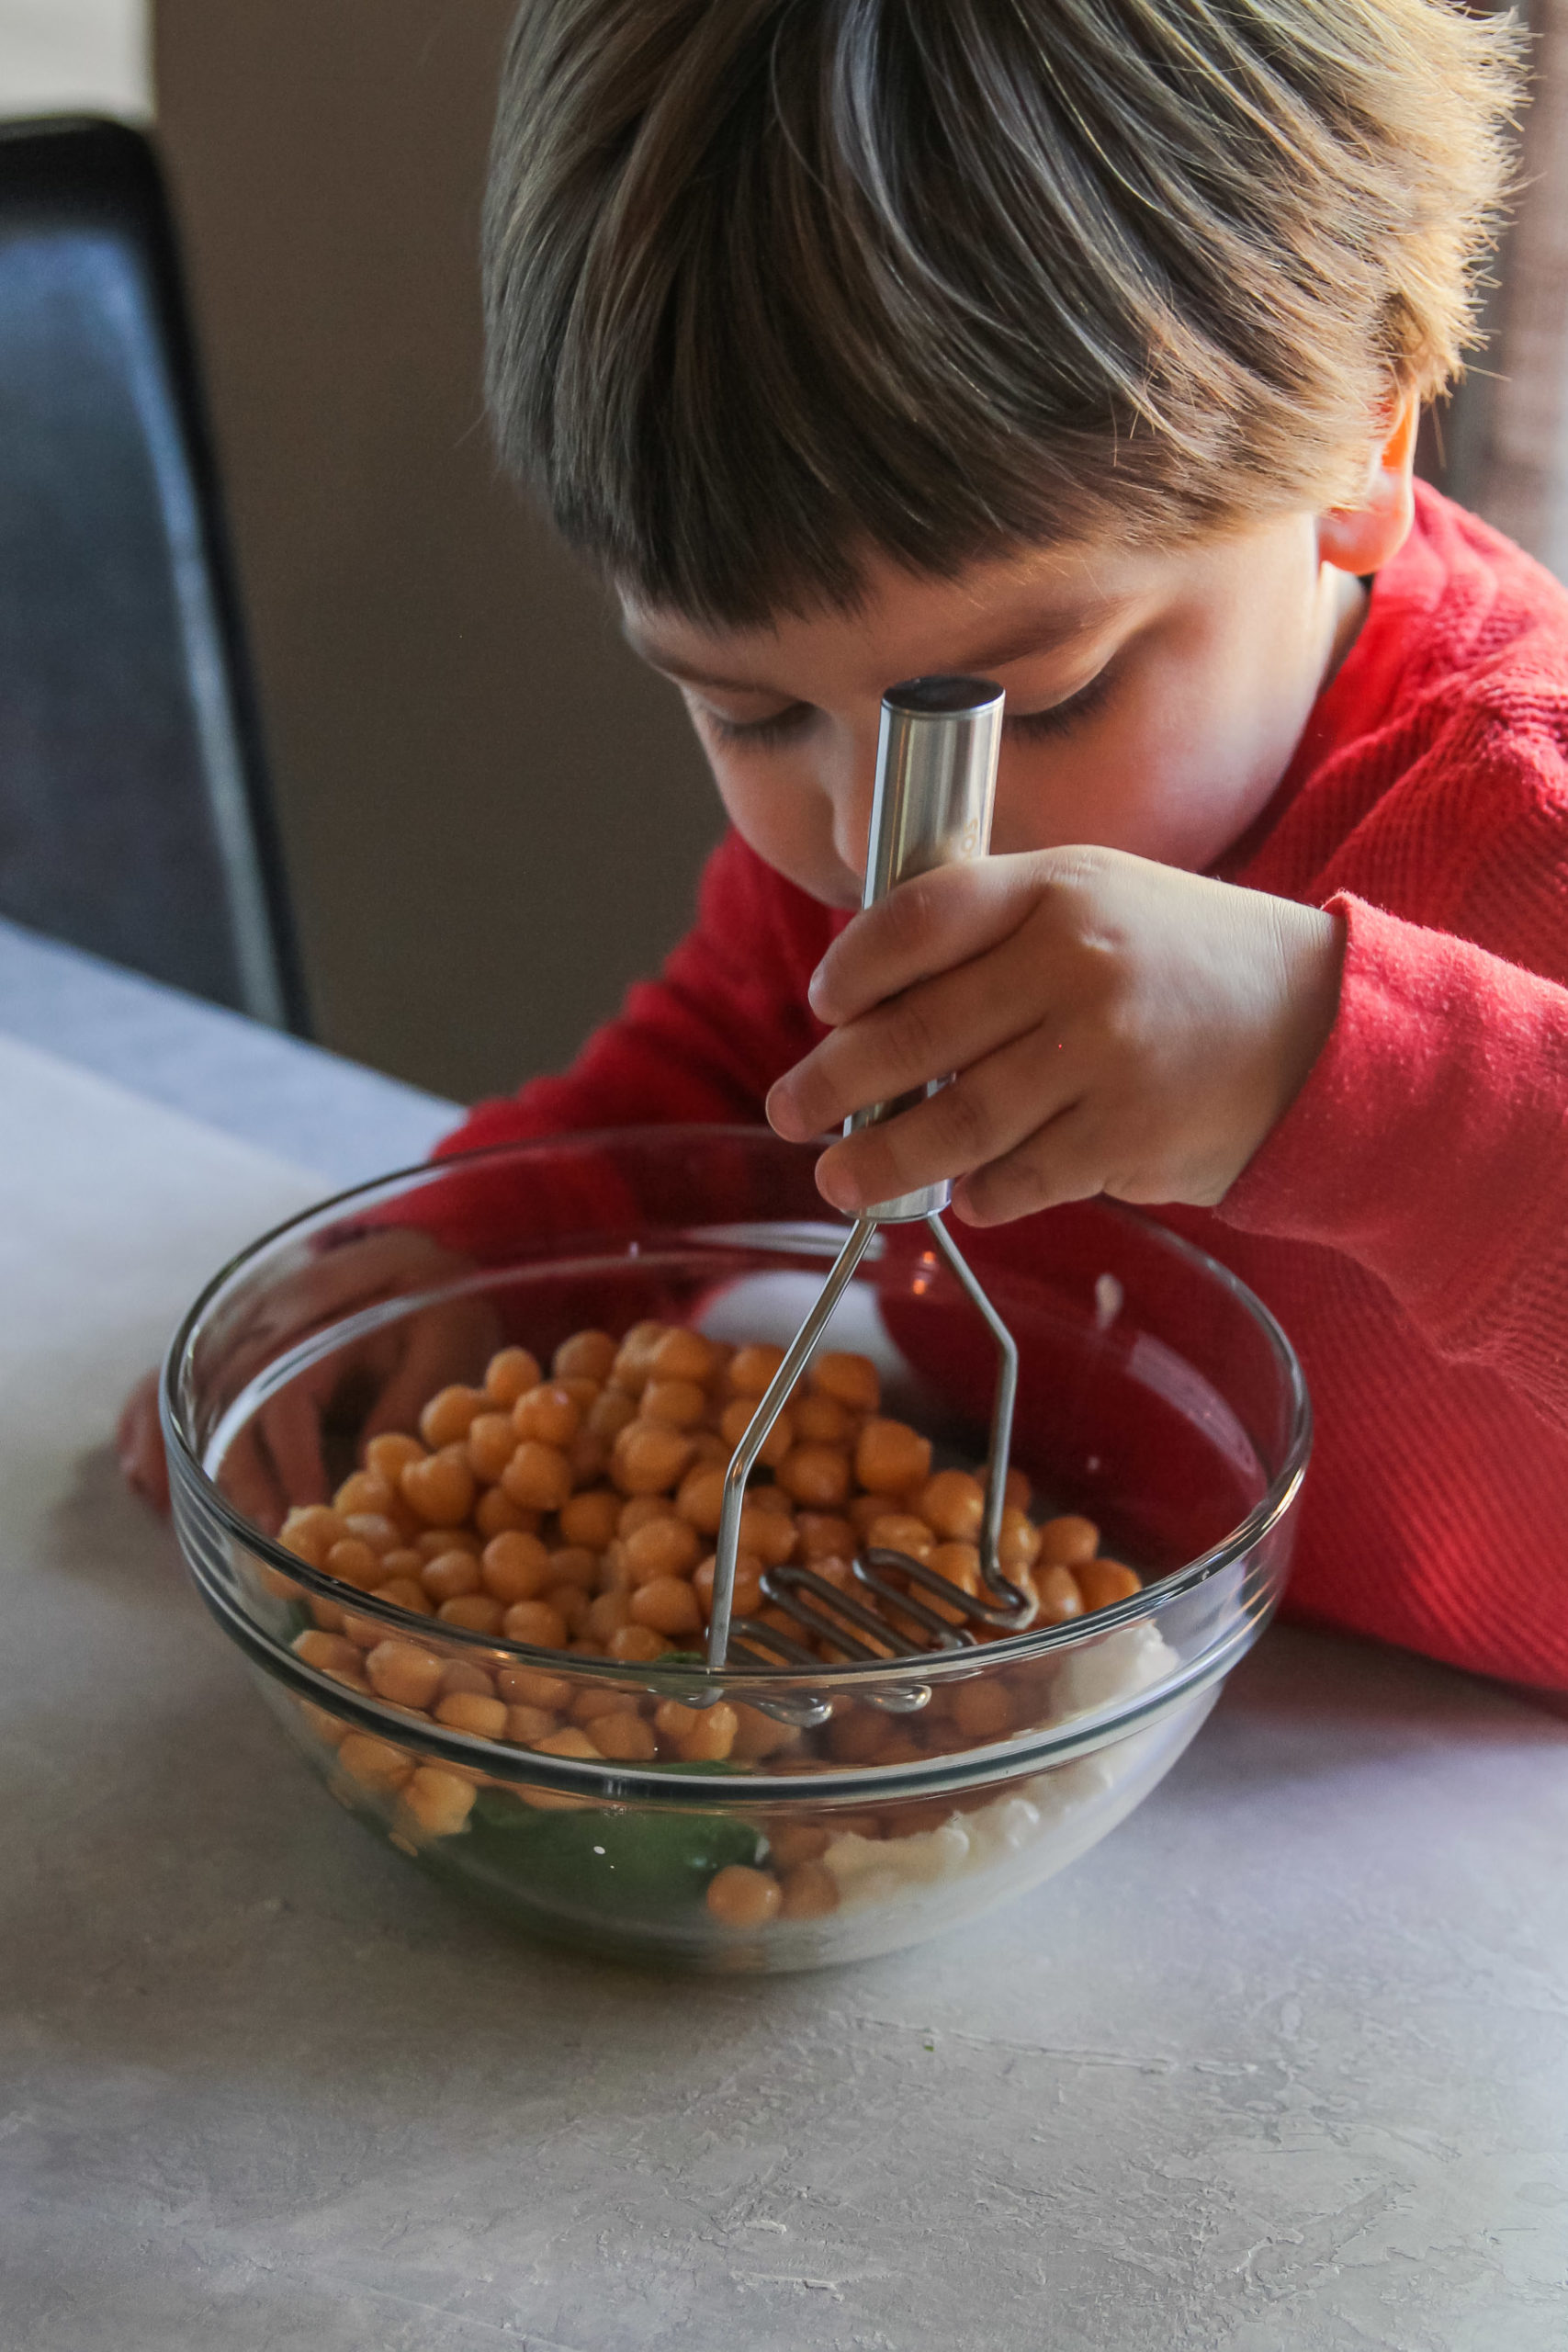 How to make chickpea avoado mash